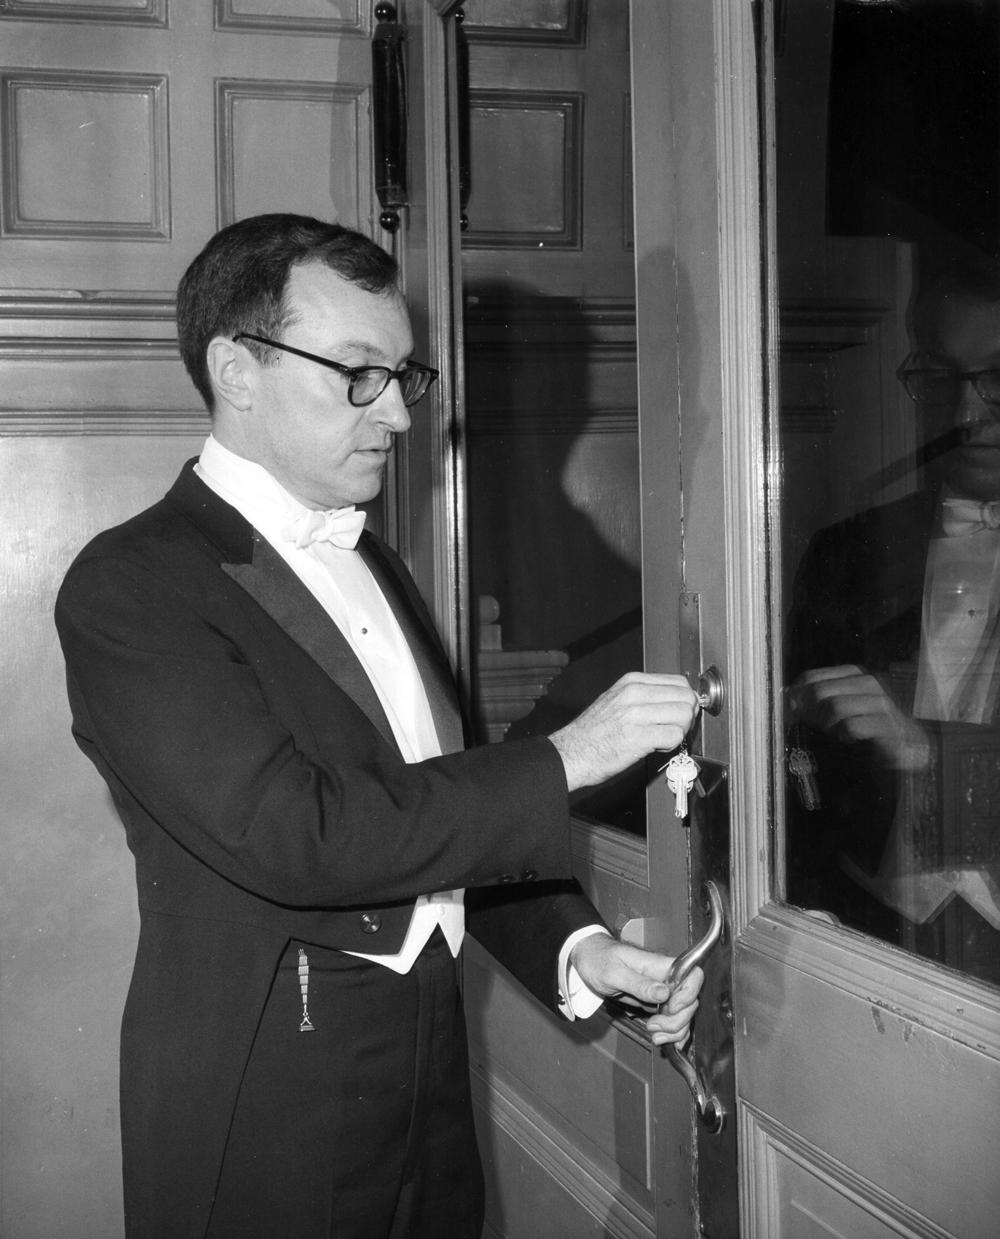 Alfred Hubay locks the doors on the Metropolitan Opera